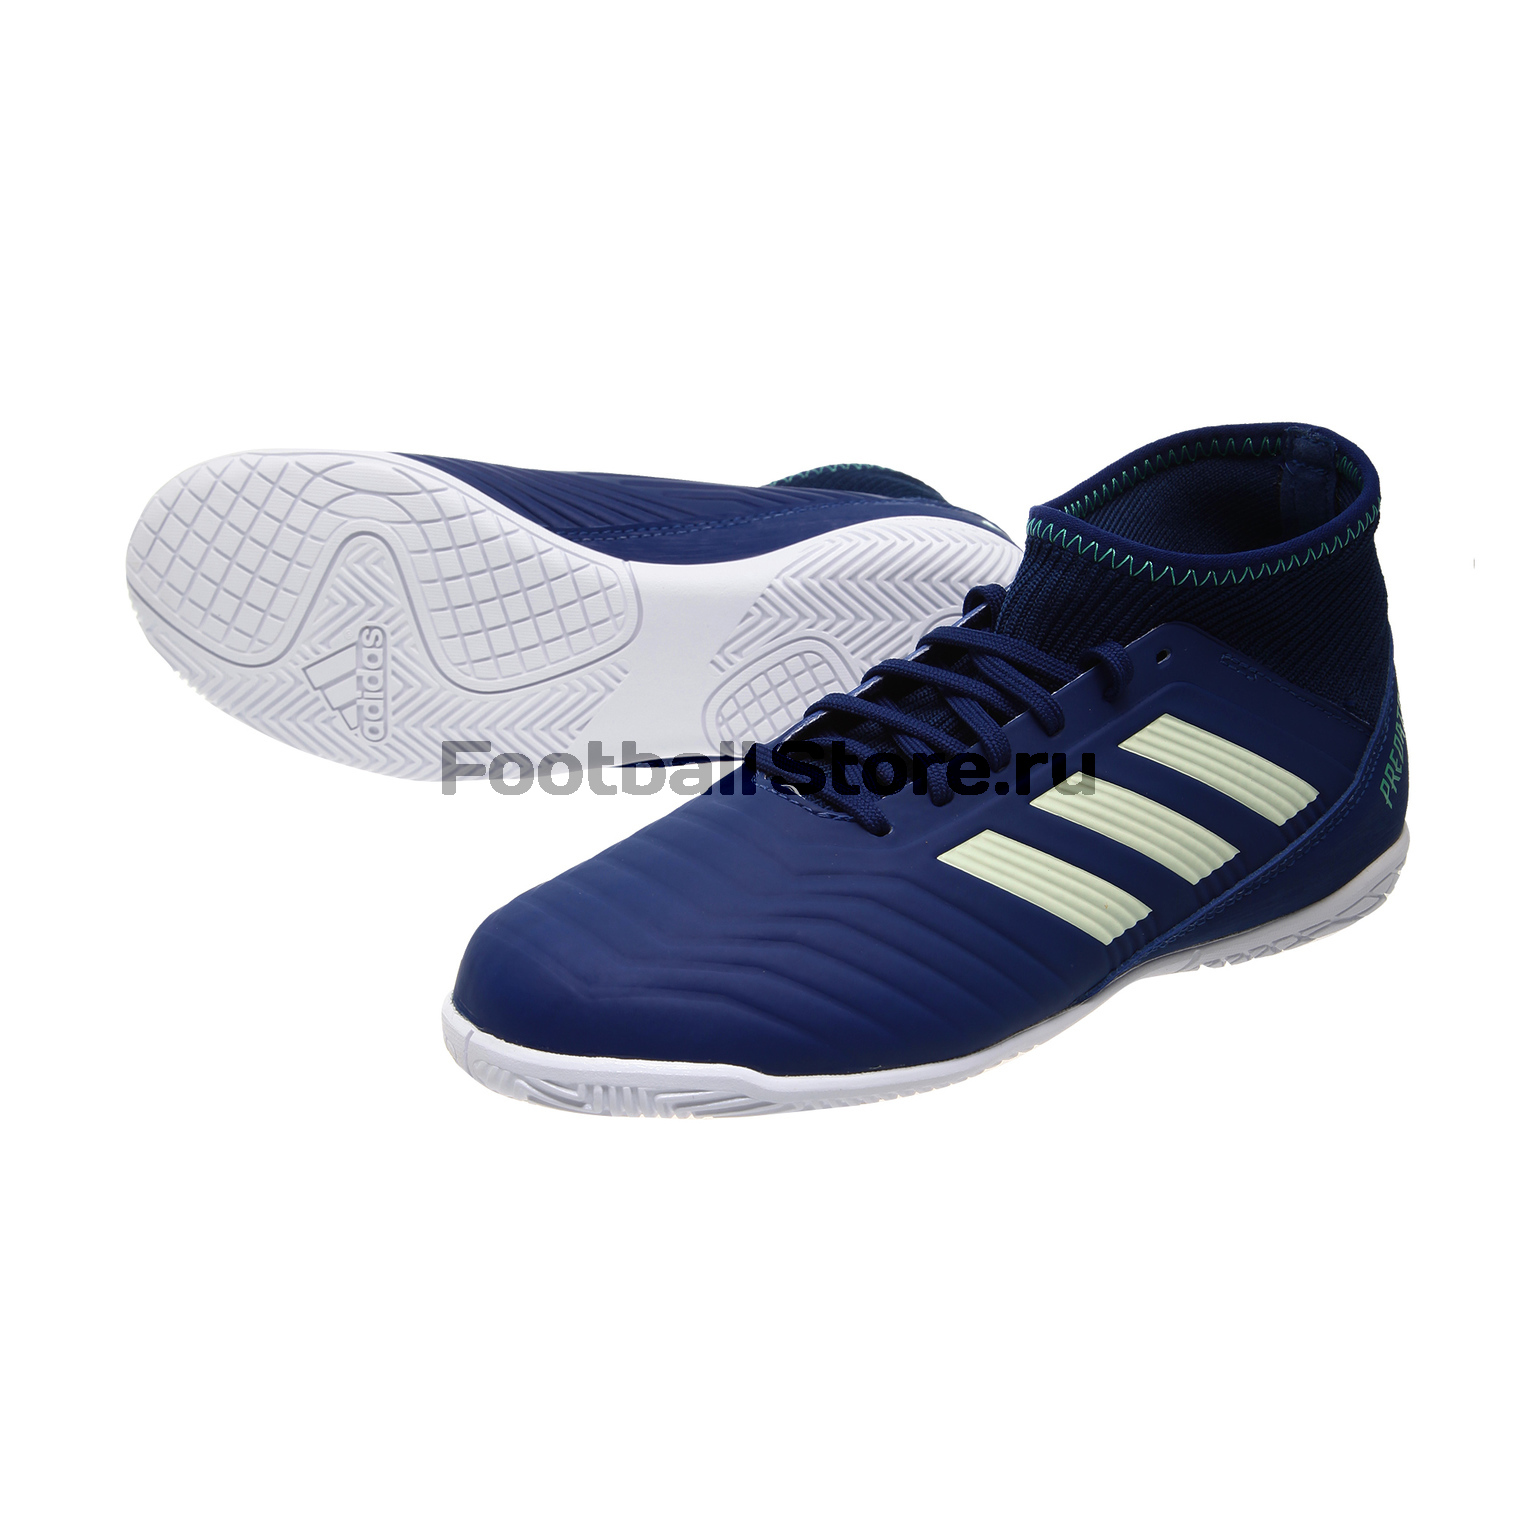 Футзалки детские Adidas ACE Tango 18.3 IN CP9075 adidas adidas ace 16 1 ct